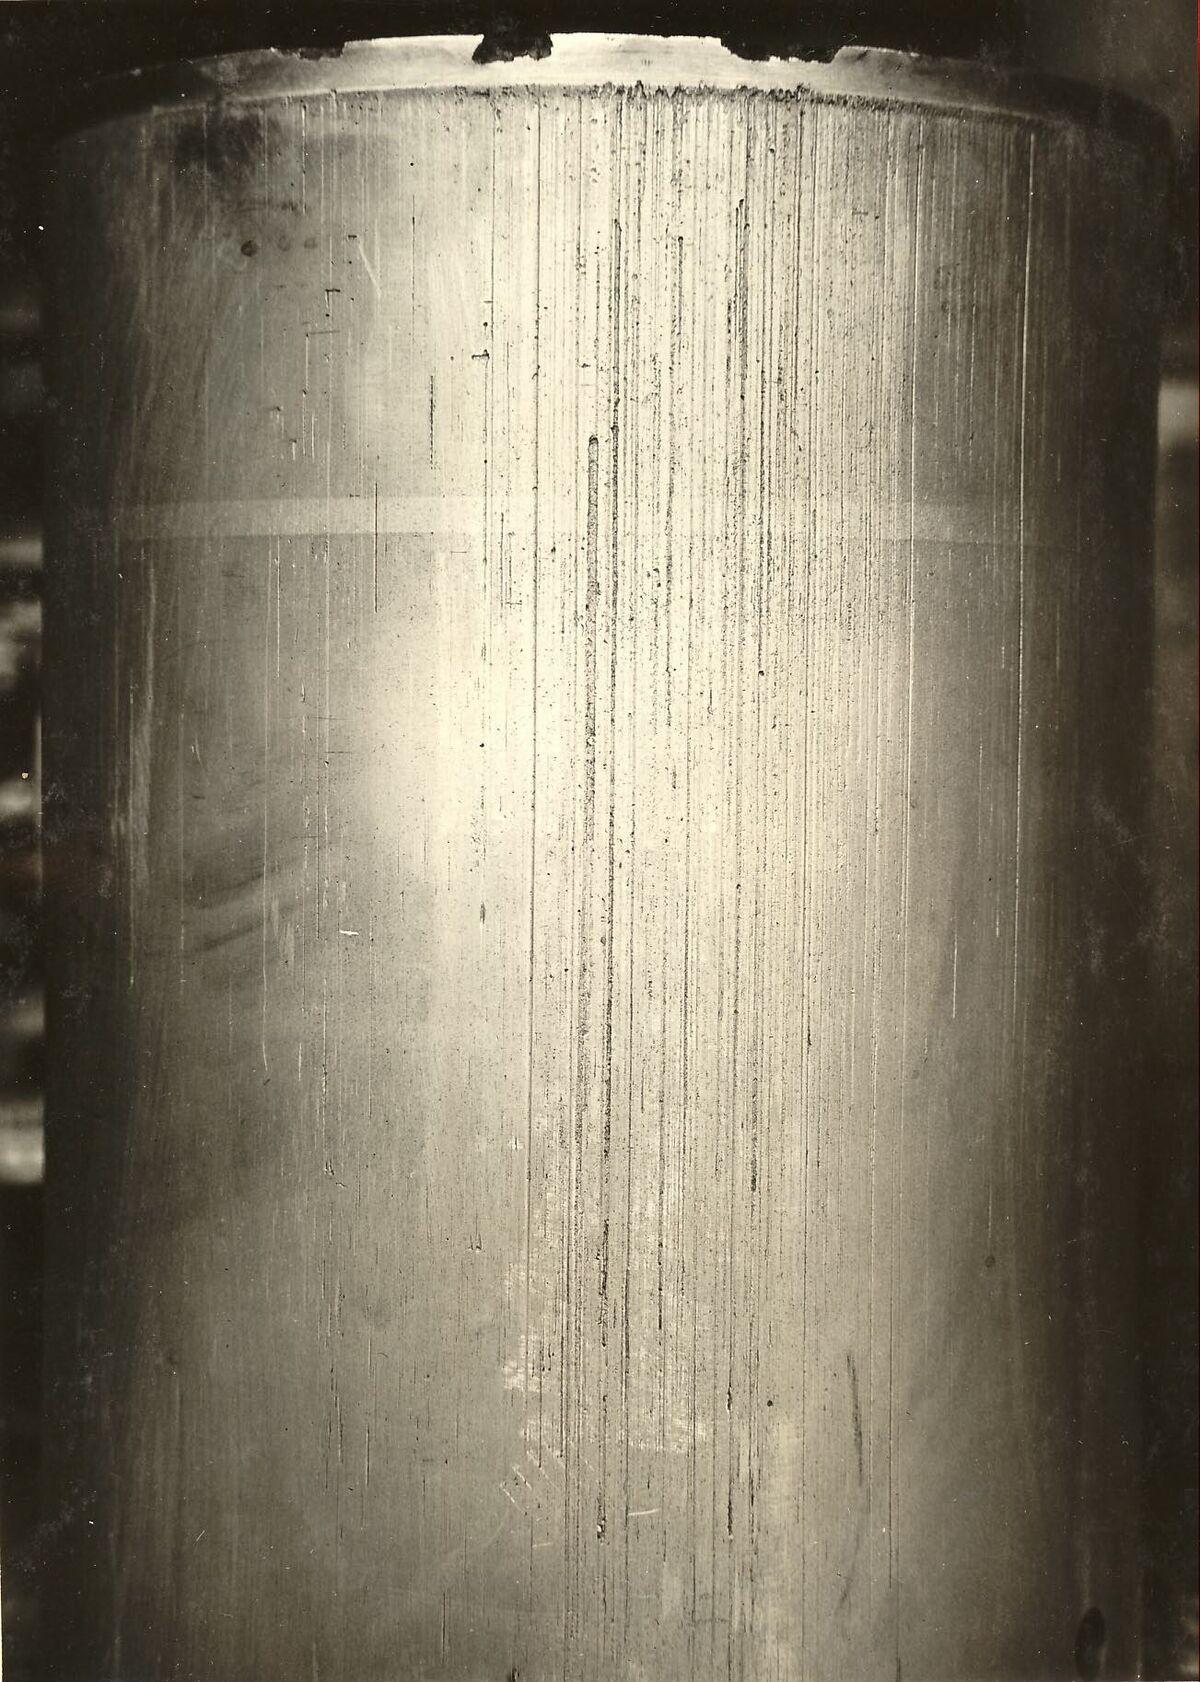 GFA 24/53.1179: Nicholls moulding machine